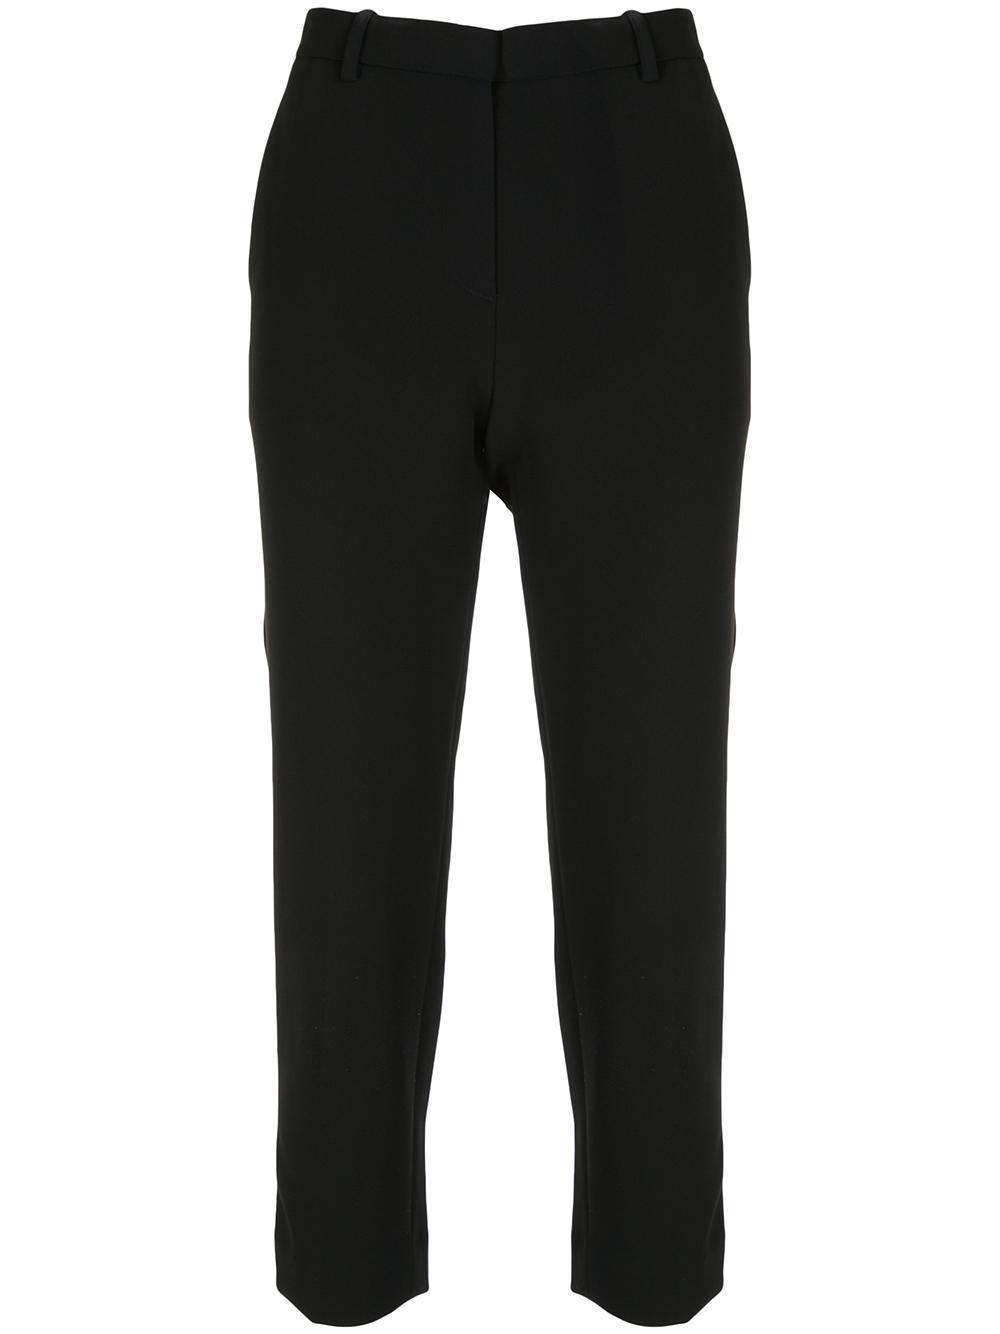 Tailored Admiral Crepe Trouser Item # J0709220